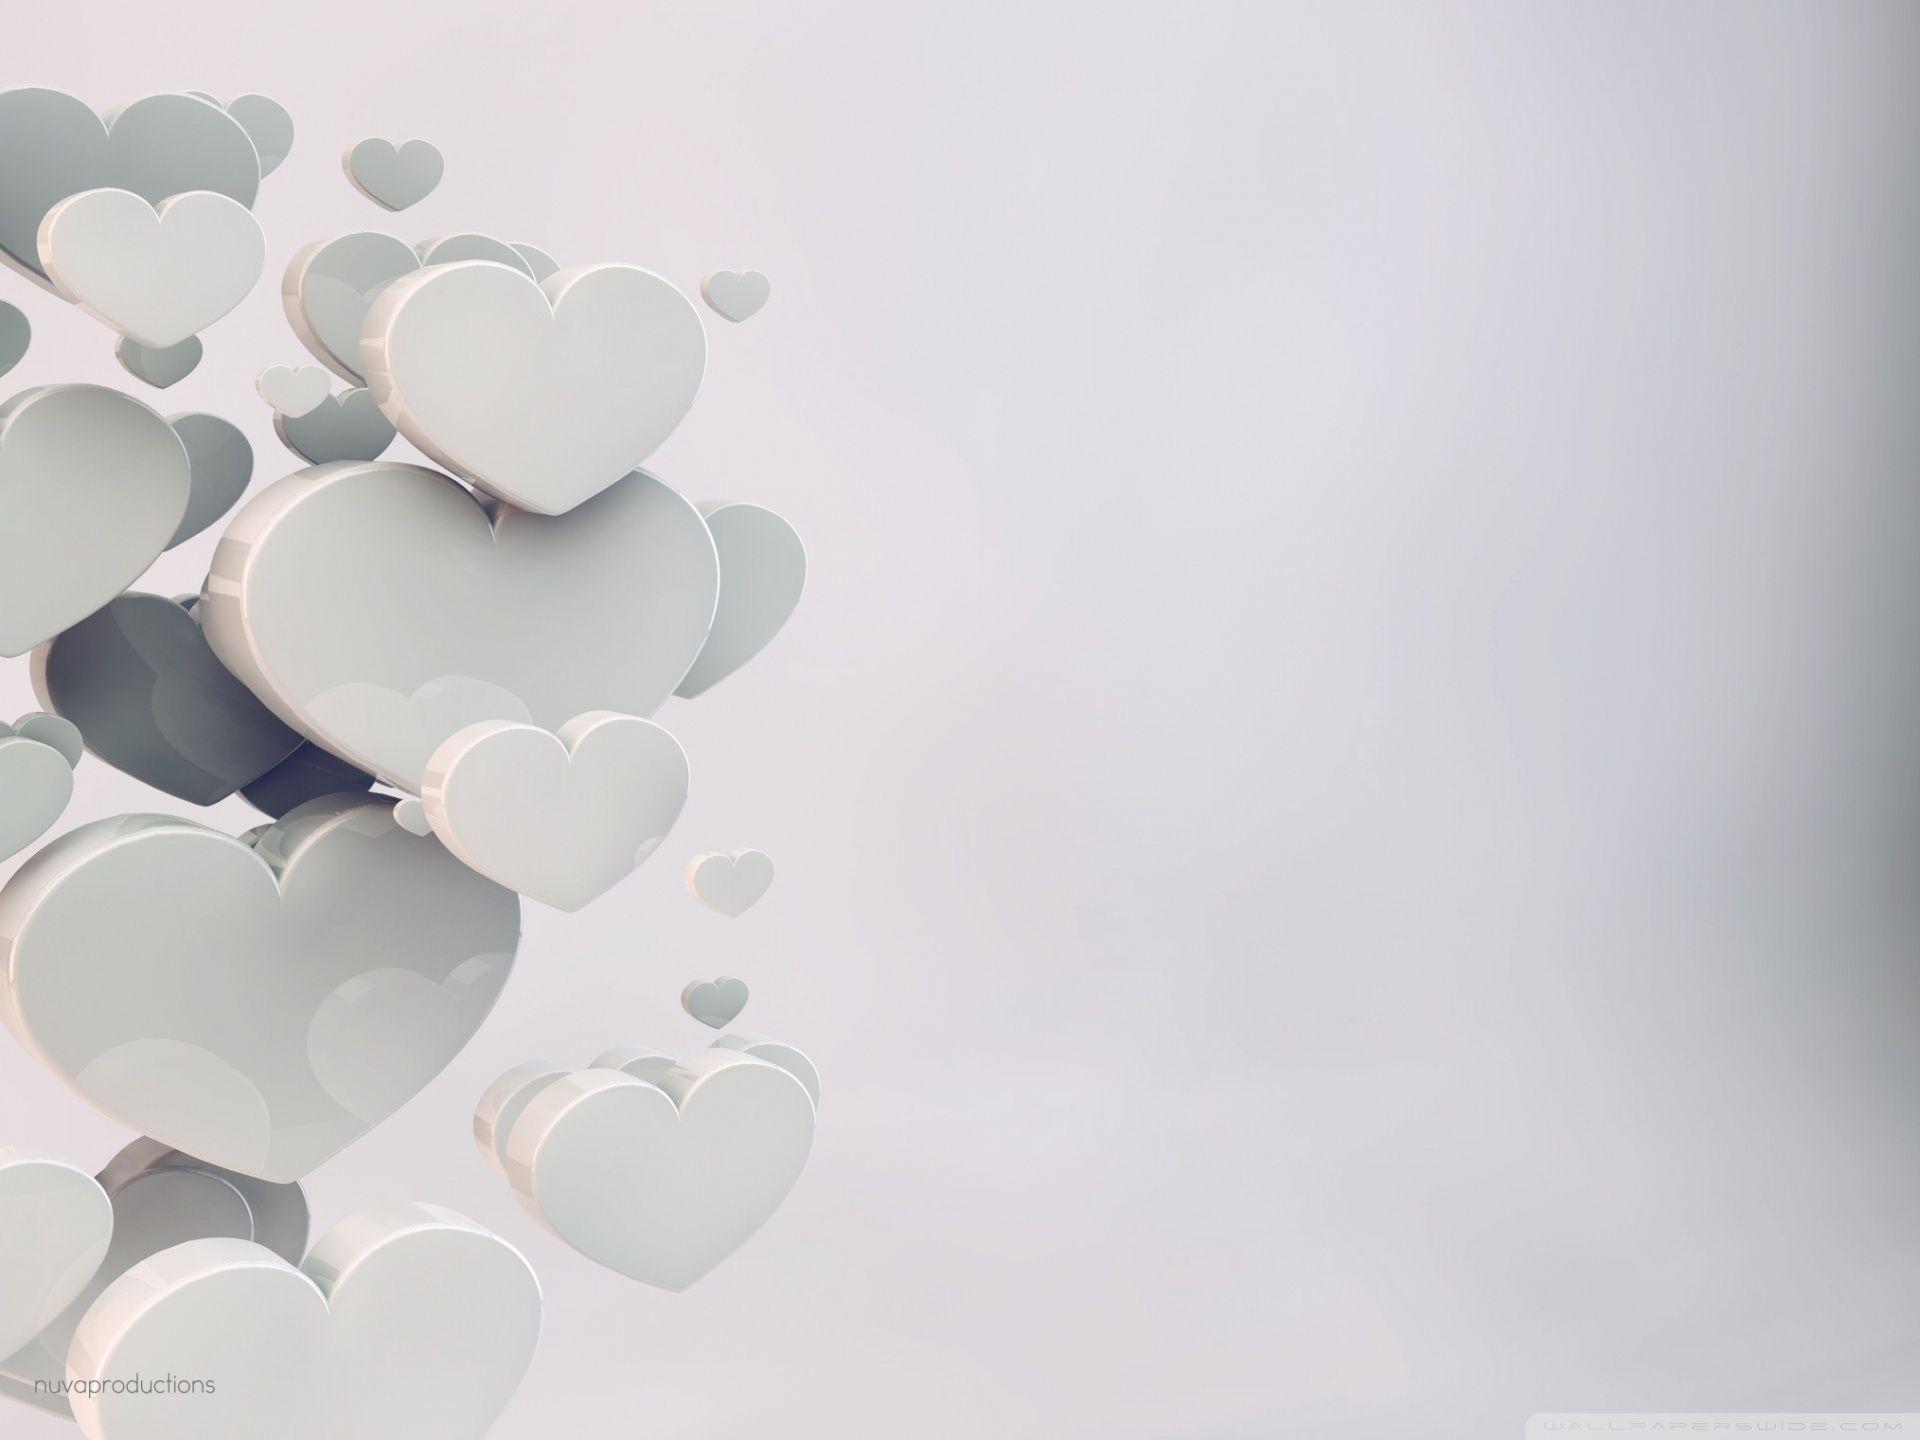 Wedding Wallpapers Top Free Wedding Backgrounds Wallpaperaccess